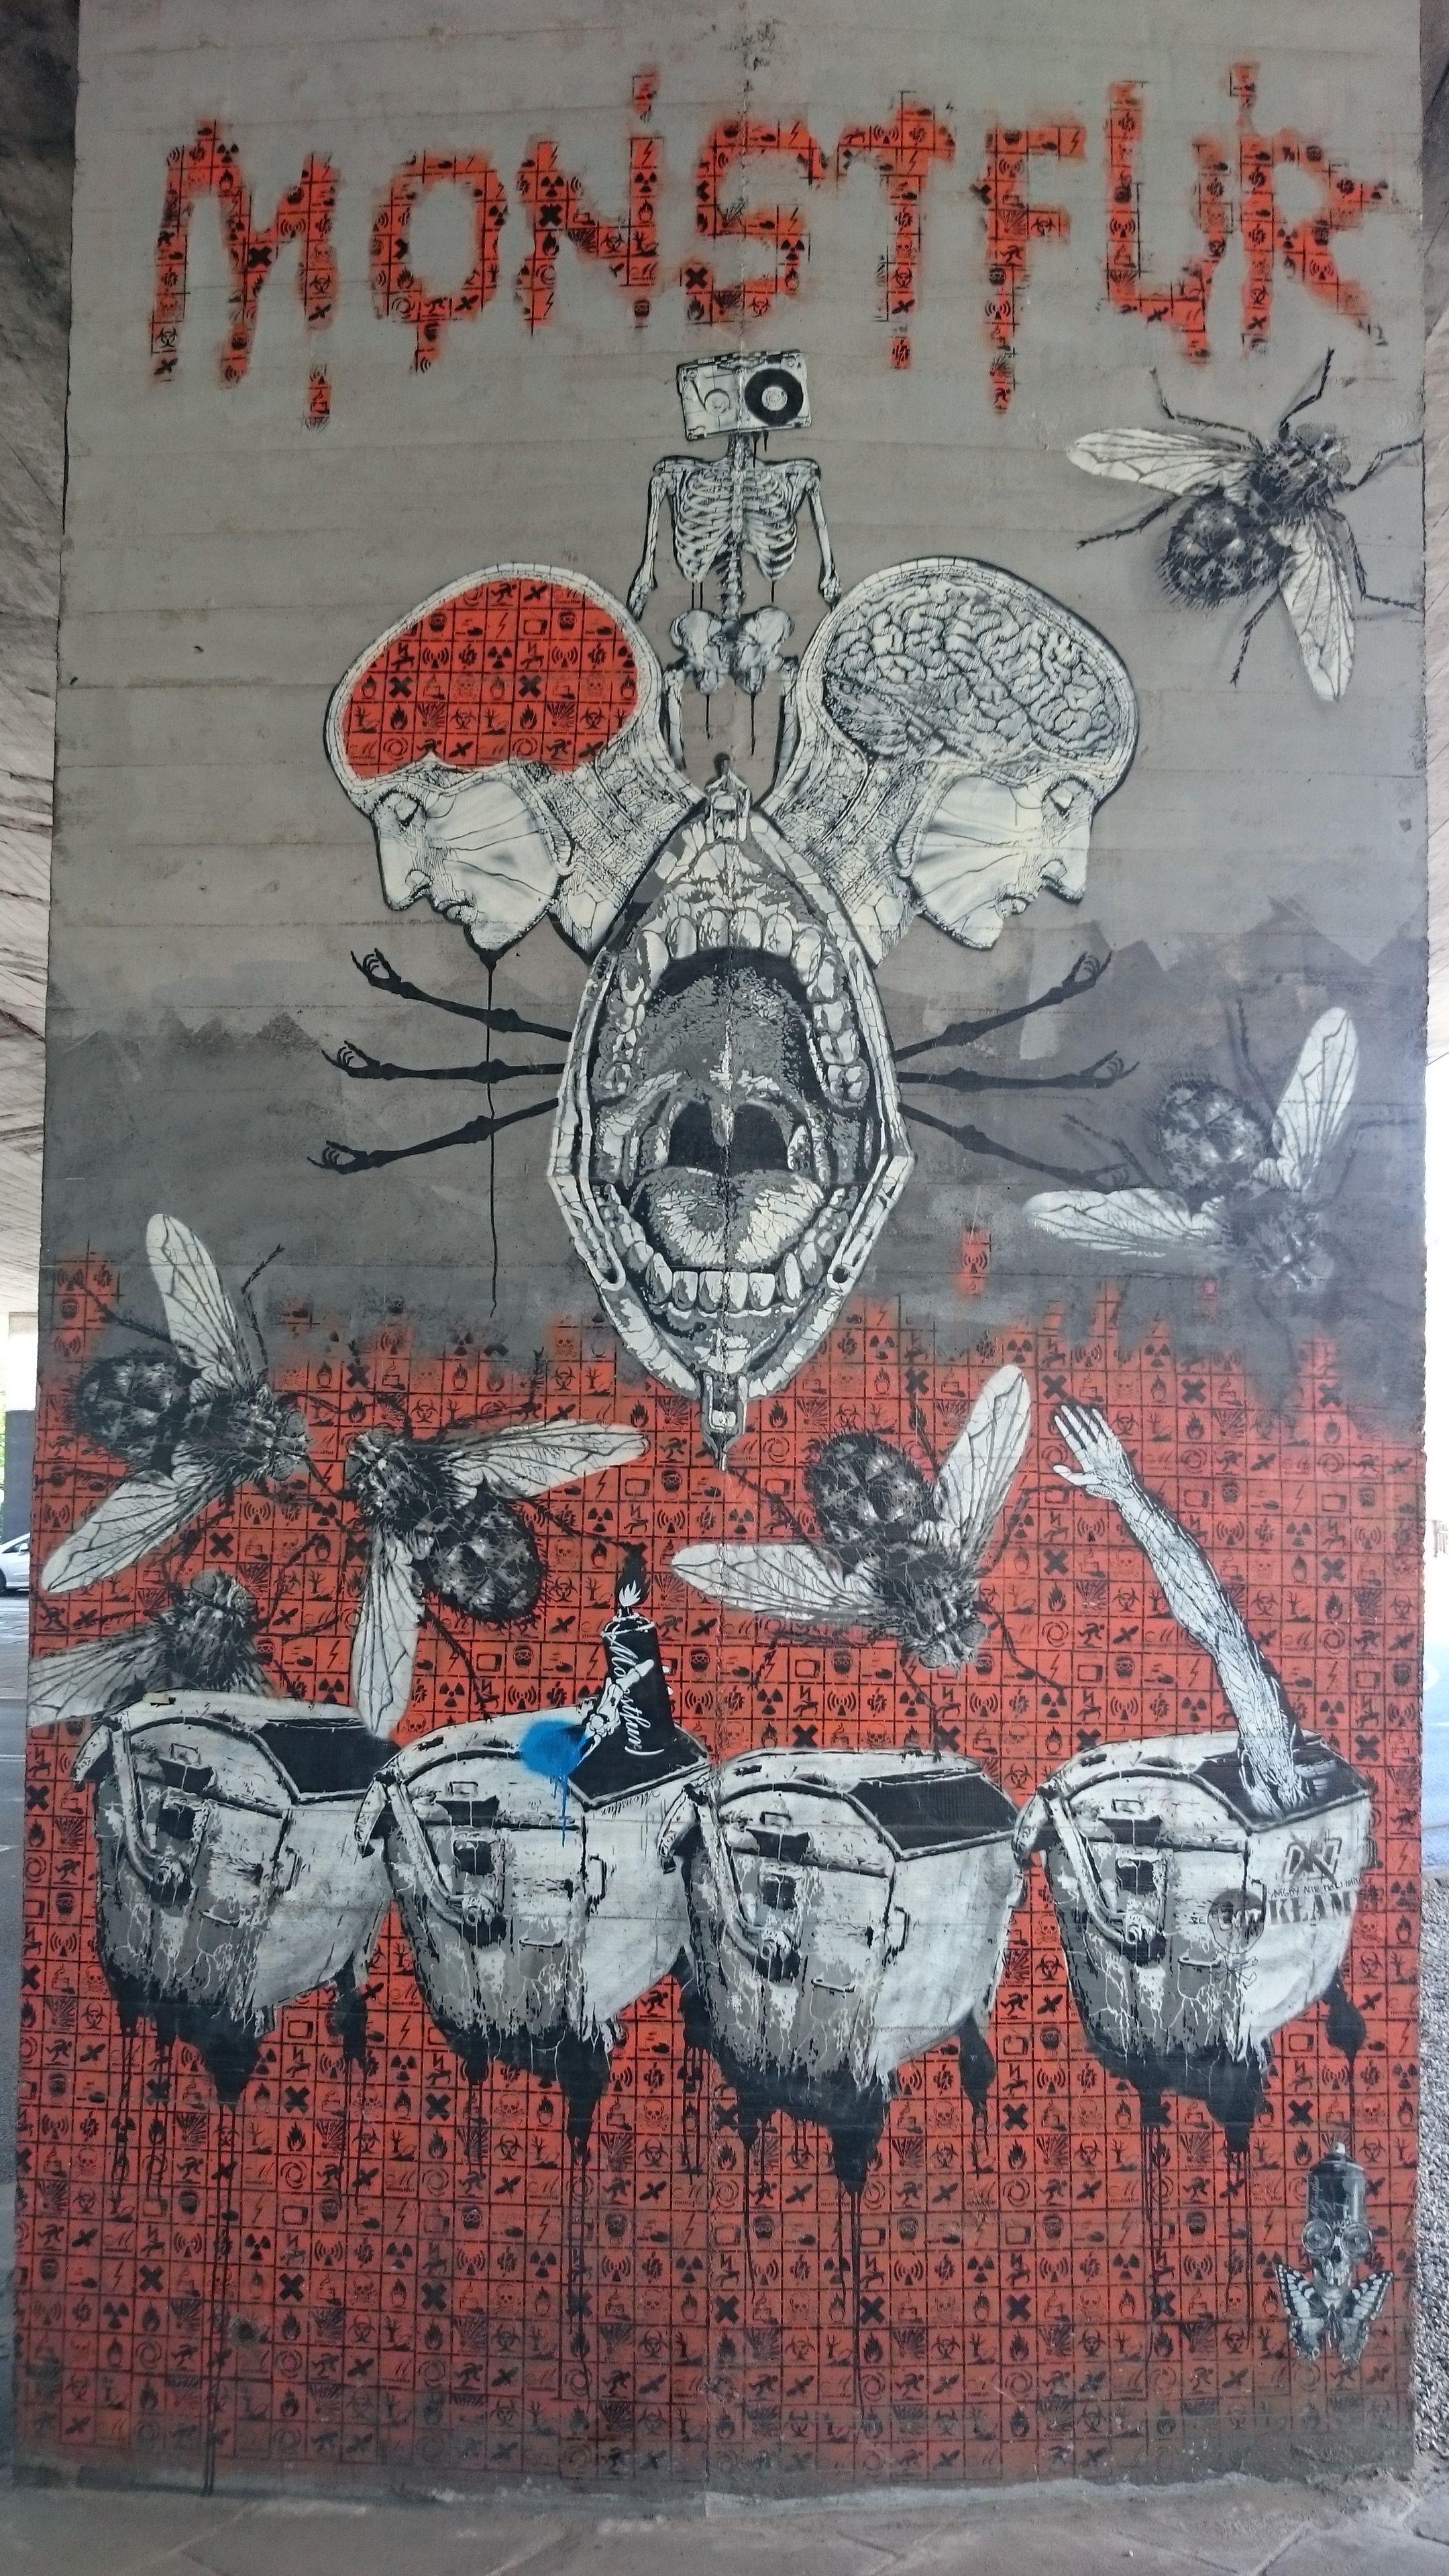 #warsaw #streetart #alternativeart